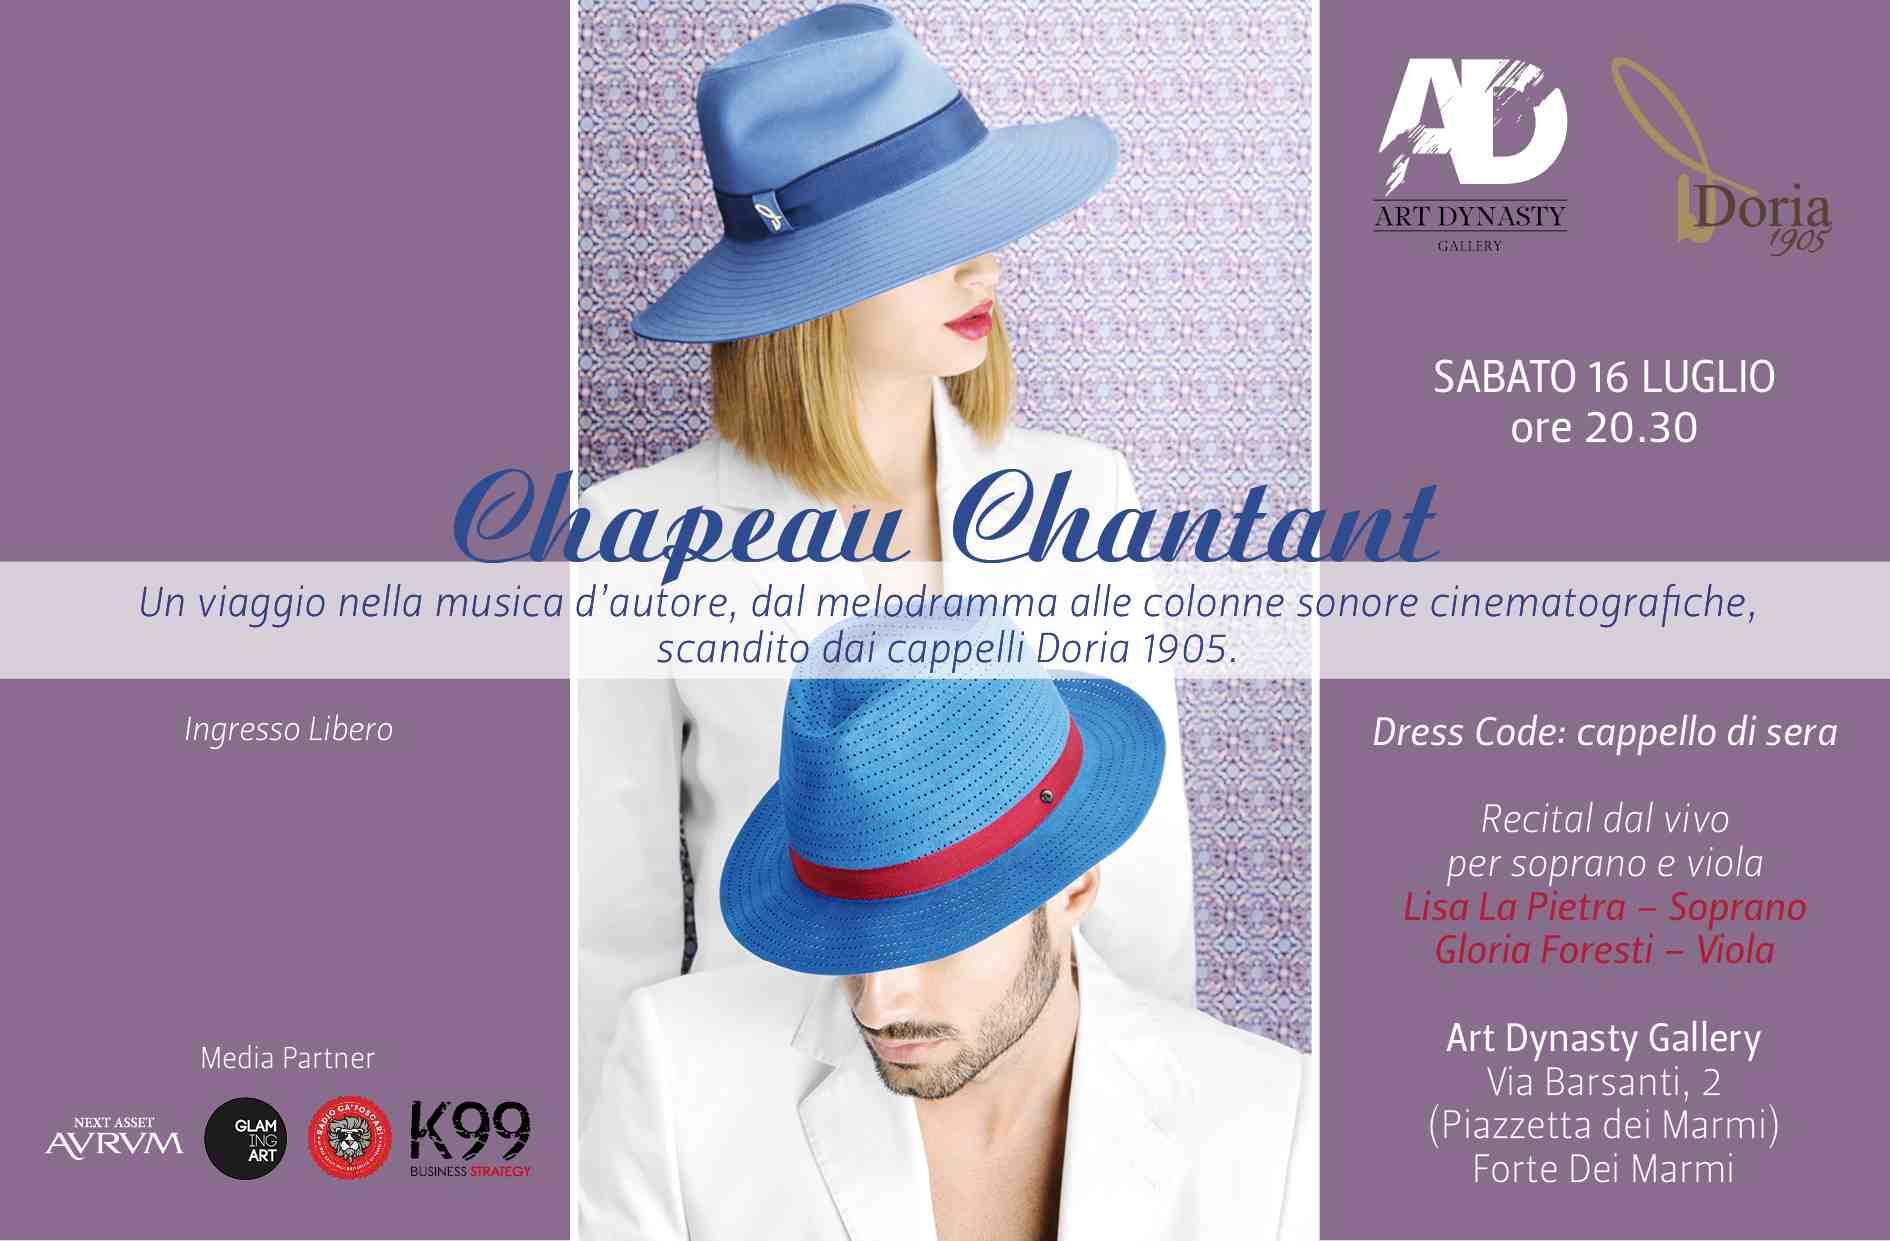 Chapeau Chantant